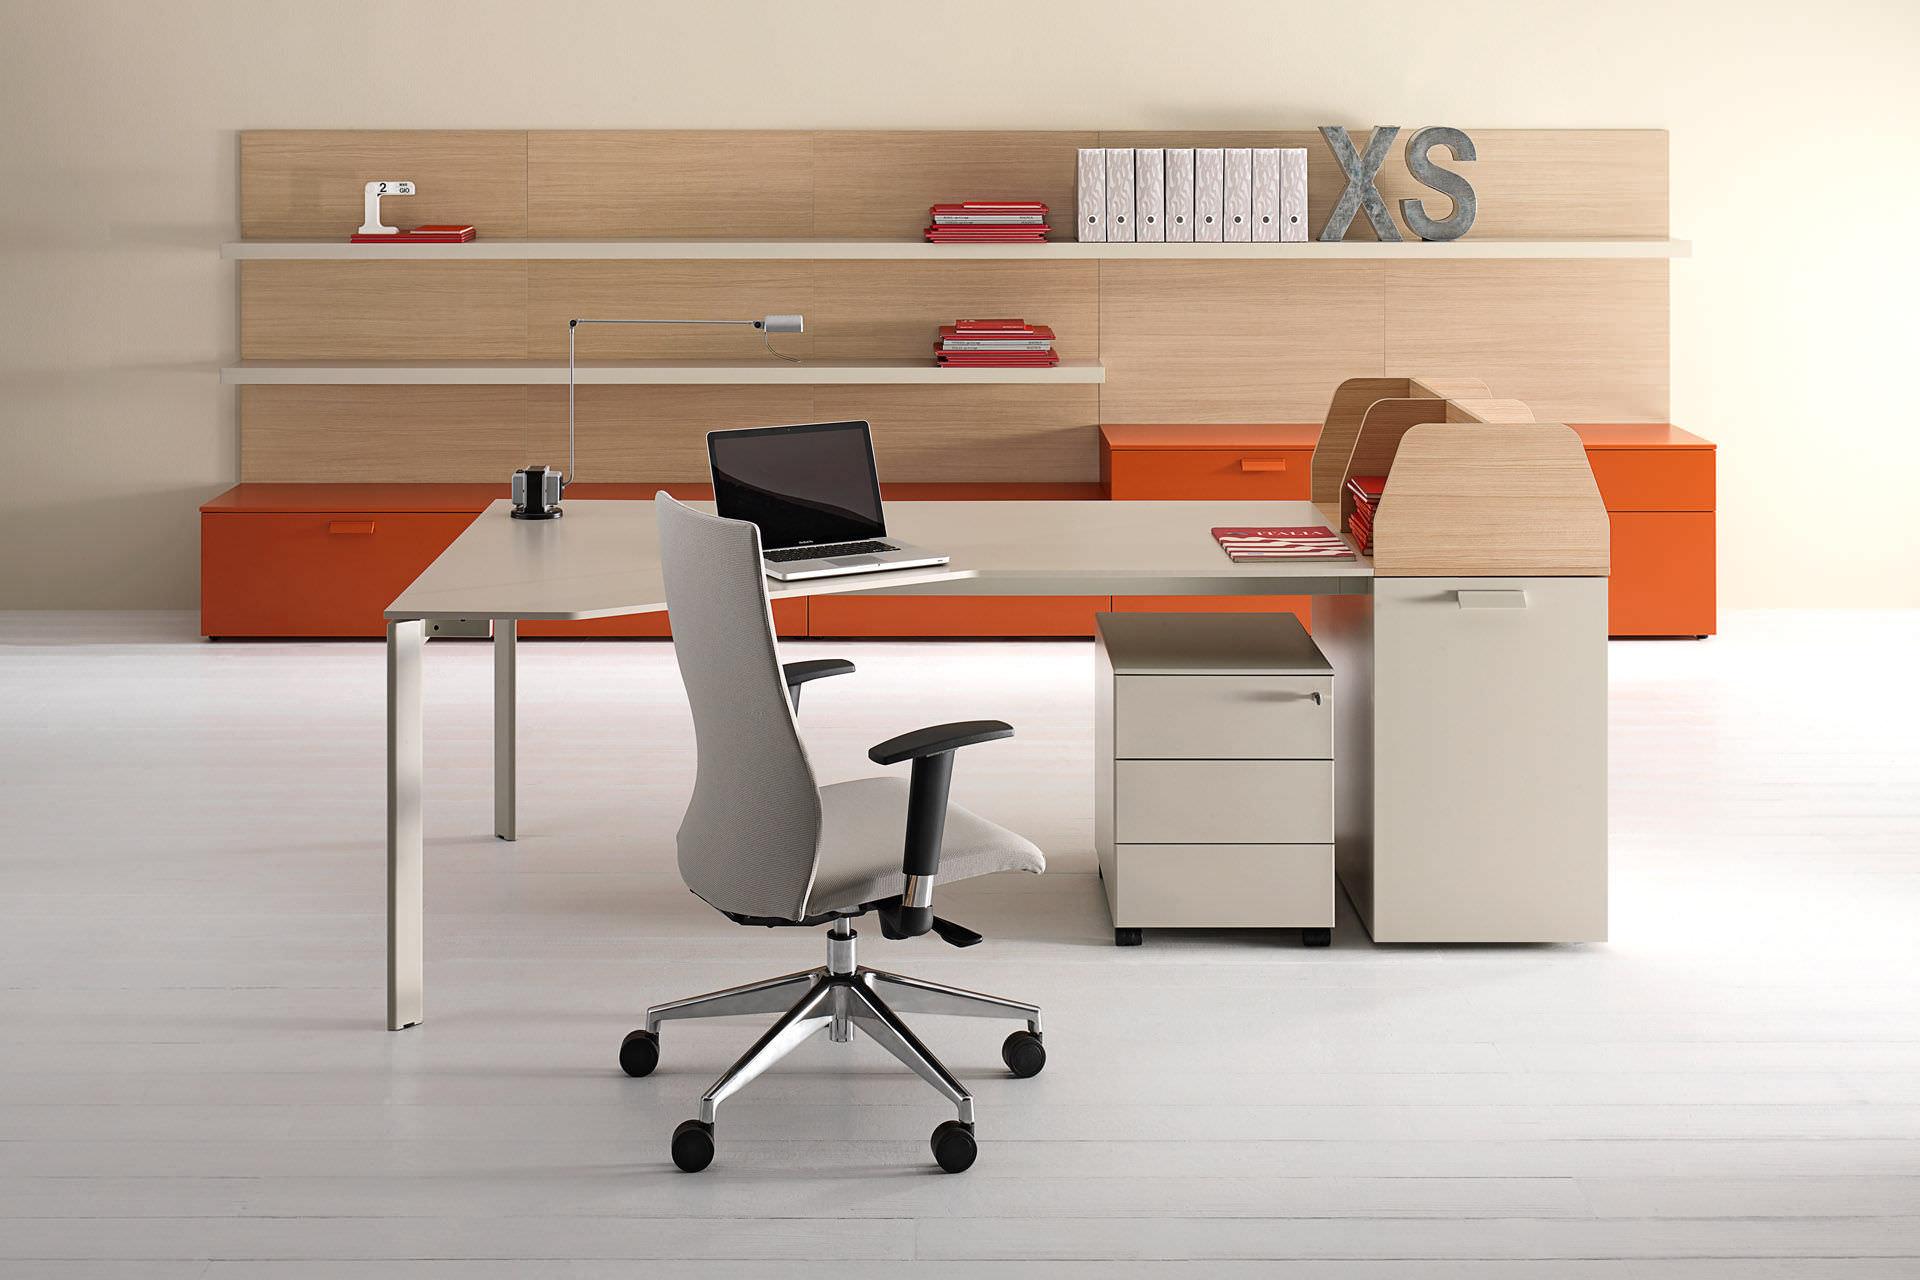 muebles-modernos-para-oficina5.jpg